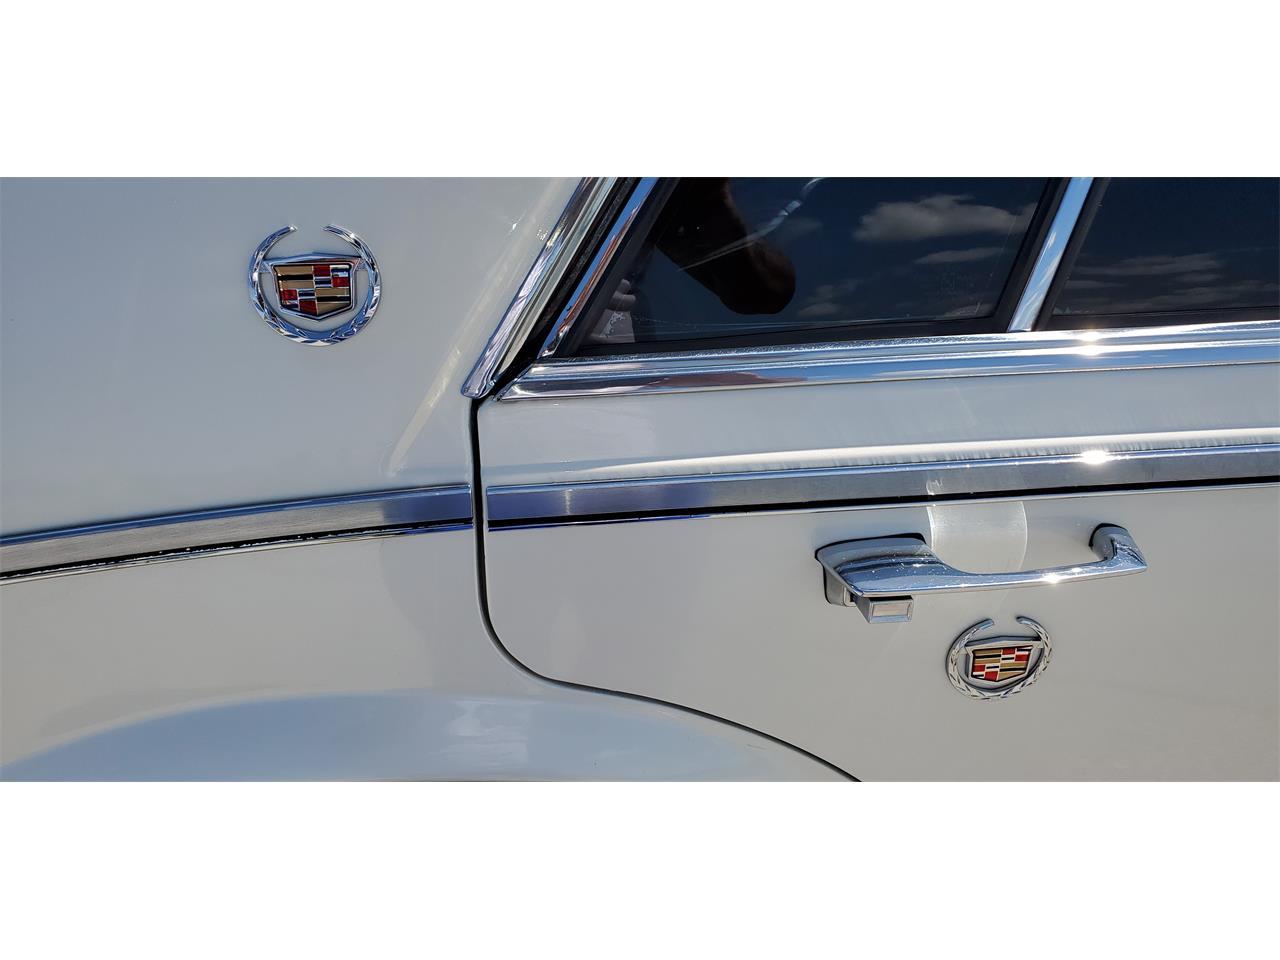 Large Picture of 1983 Cadillac Seville located in Missouri - QJQR